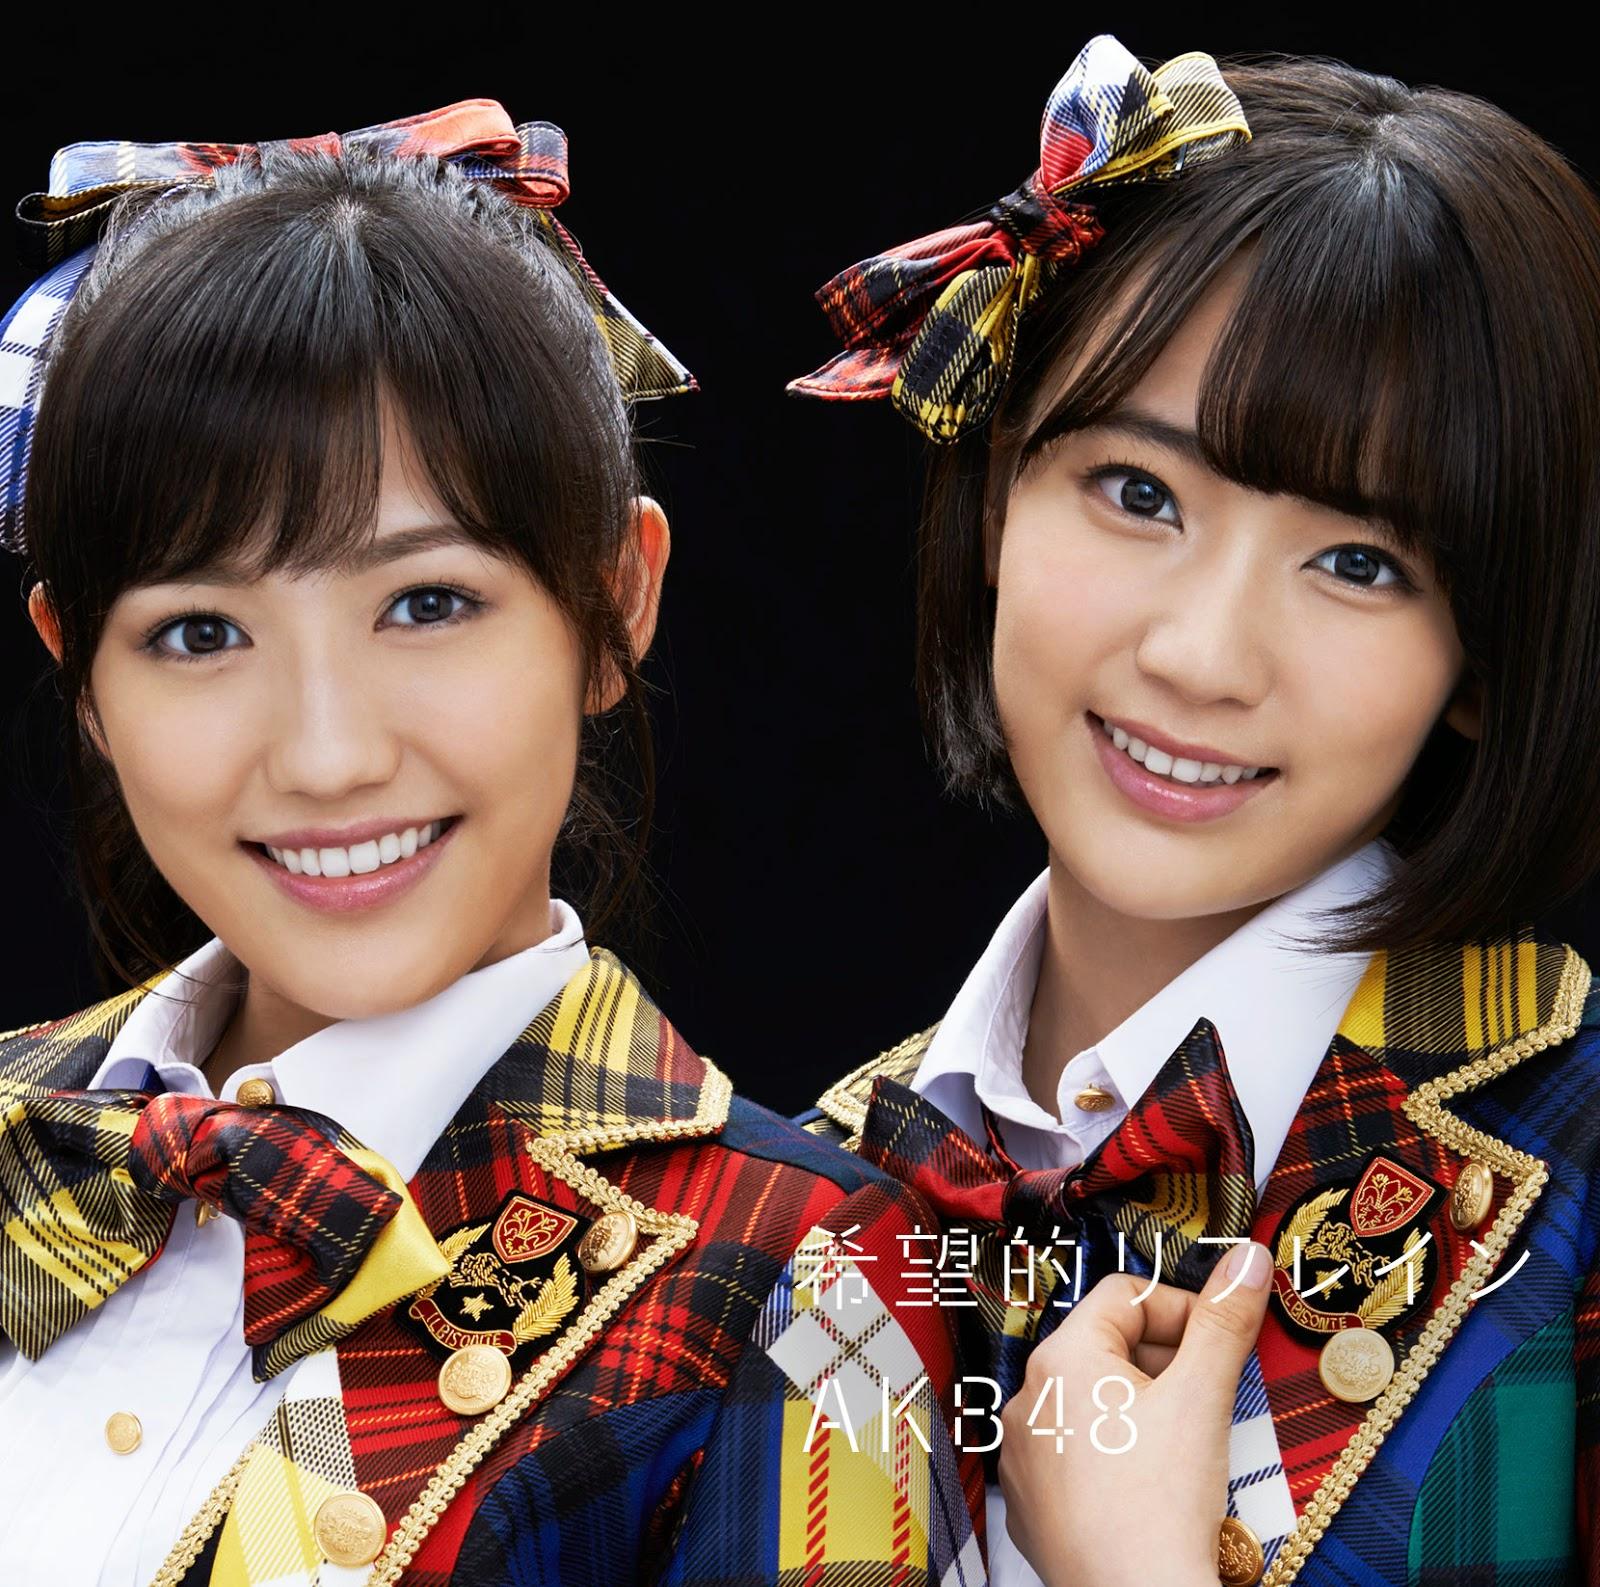 Mv Kiss And Makeup: AKB48 Kibouteki Refrain (希望的リフレイン) ジャケット Cover + Tracklist